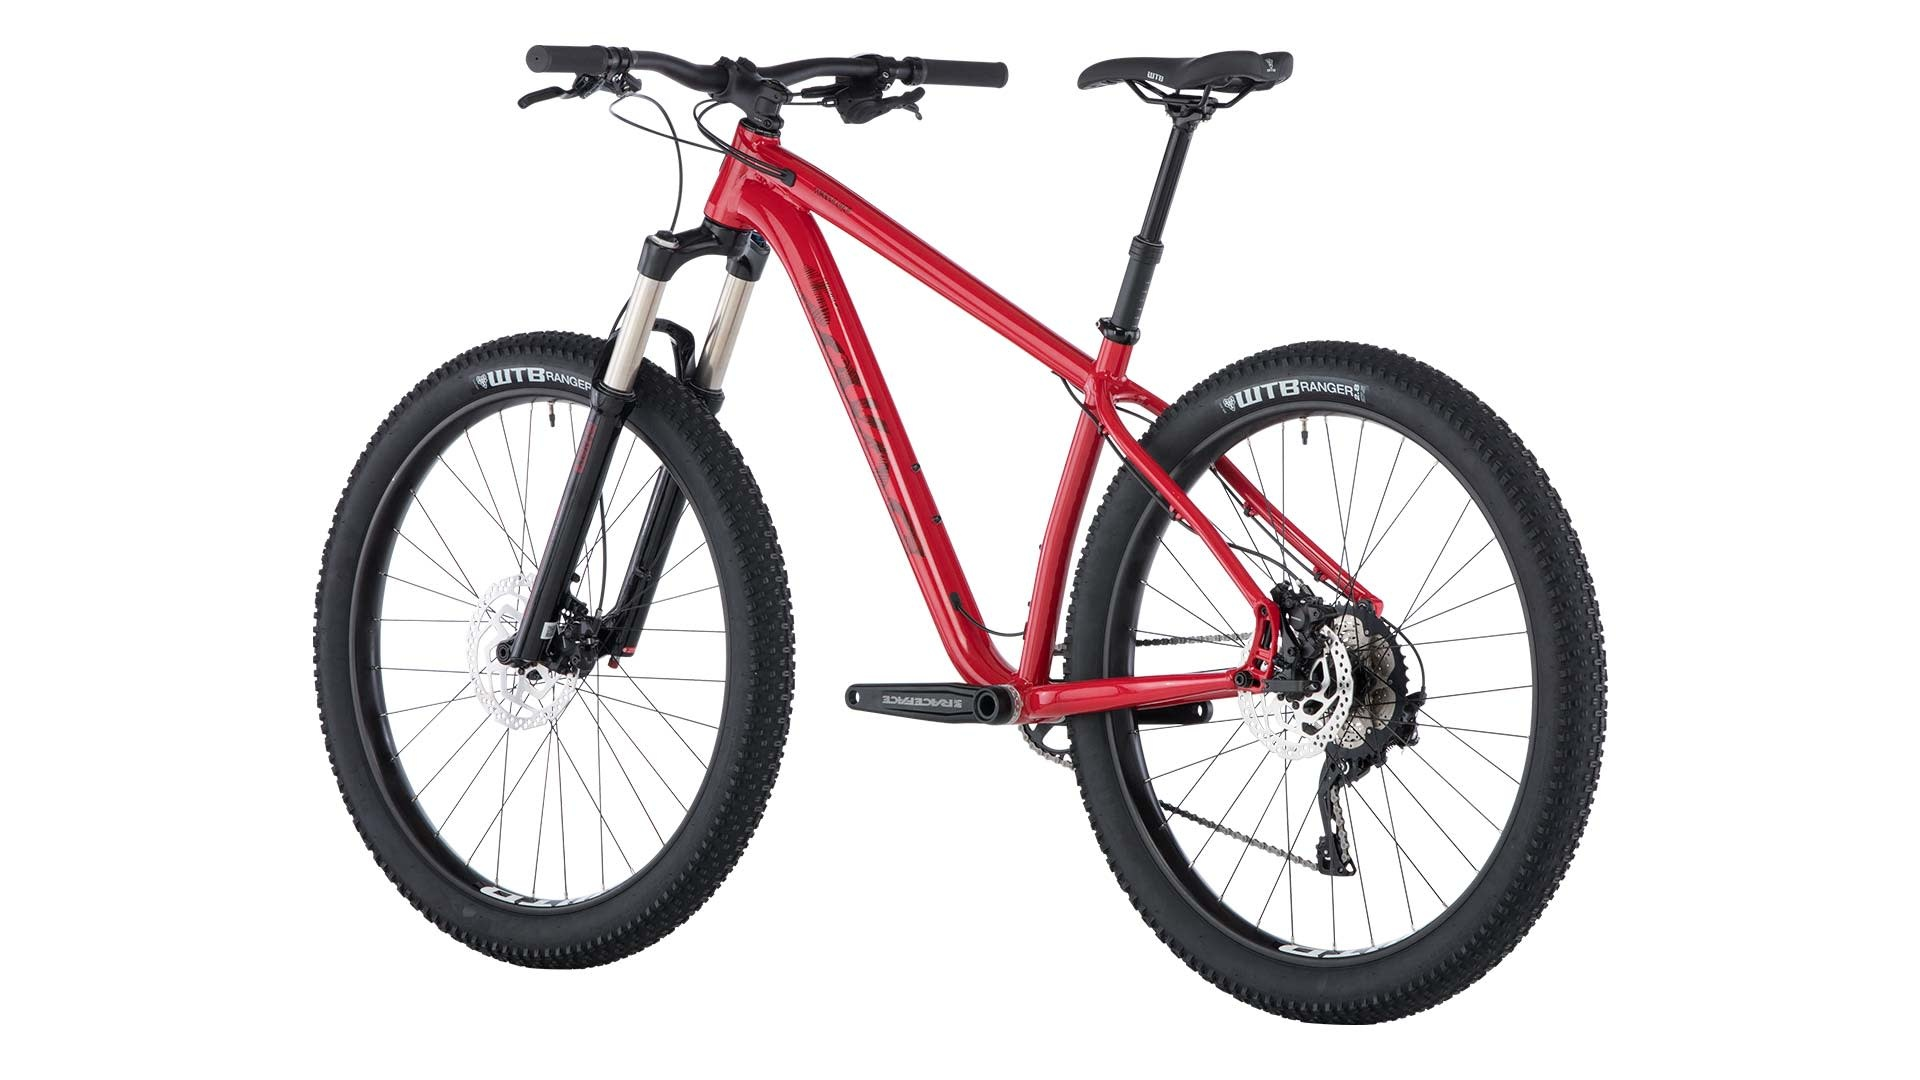 Salsa Salsa Timberjack Deore 1x 27.5+ Bike Red  2019